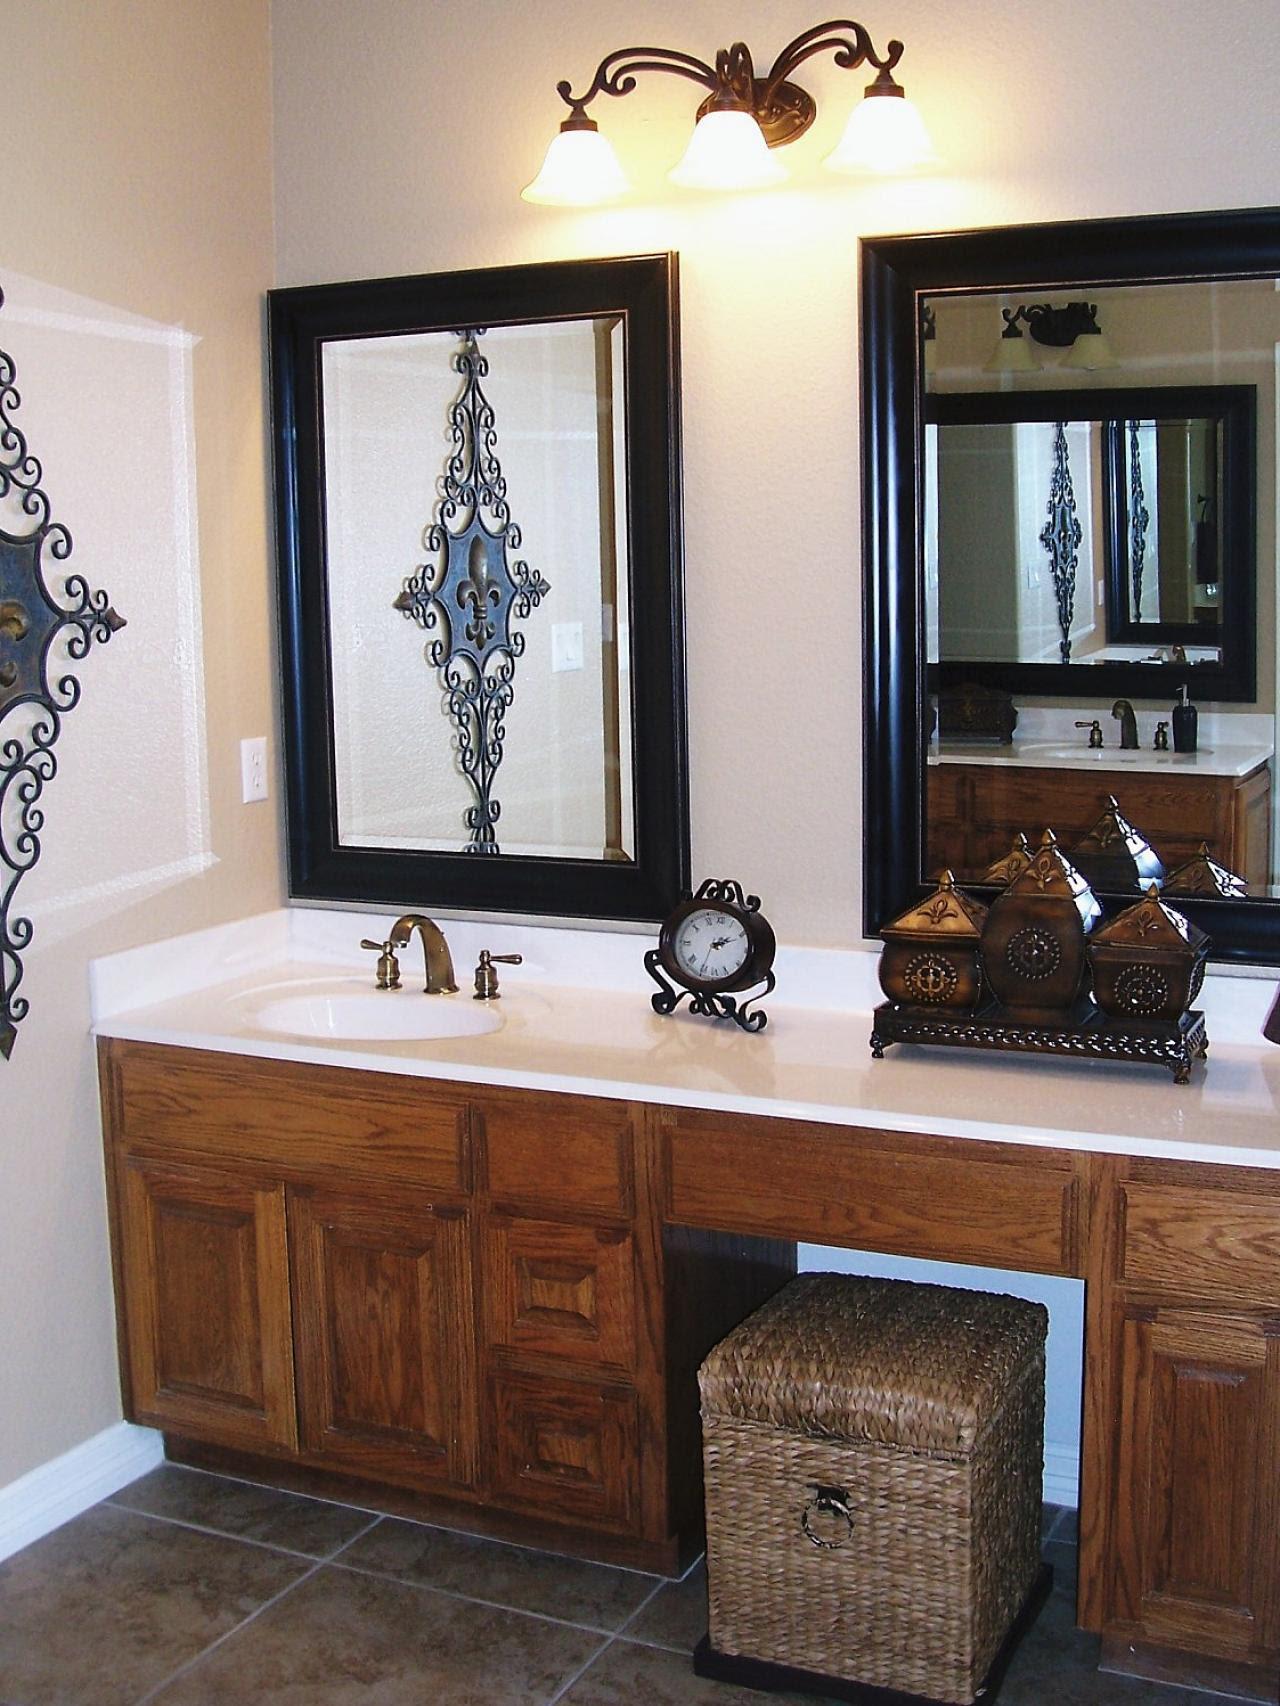 Types Of Vanity Mirrors Darbylanefurniturecom